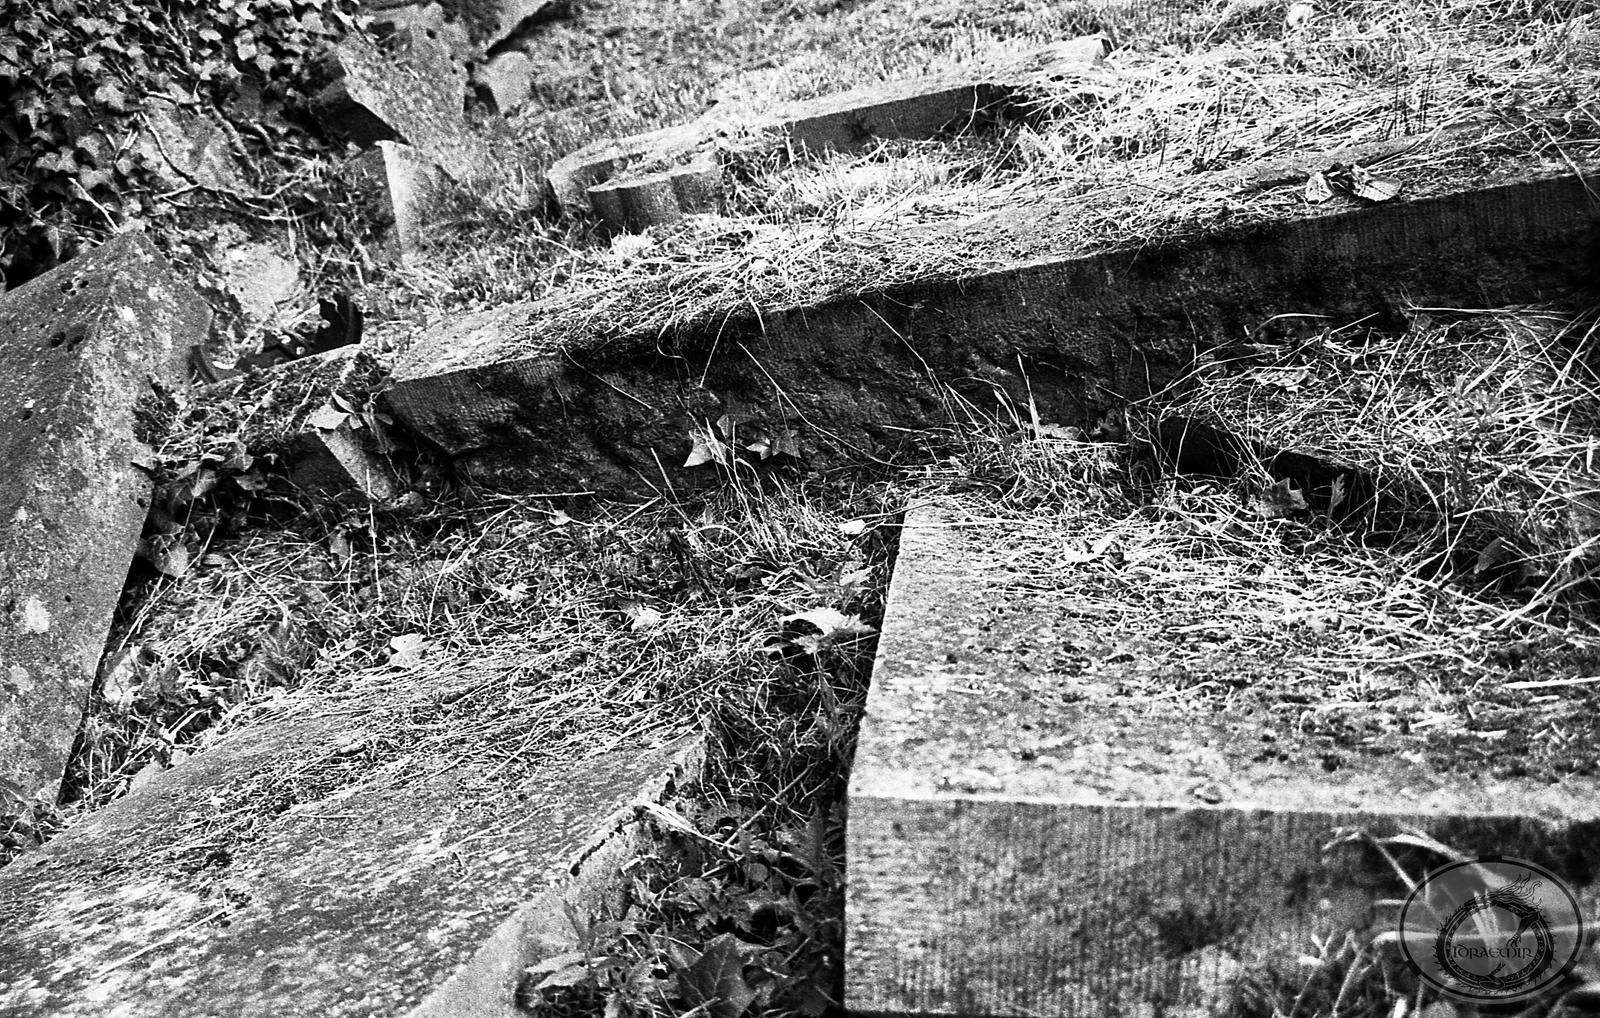 Chaotic Graveyard by Idraemir